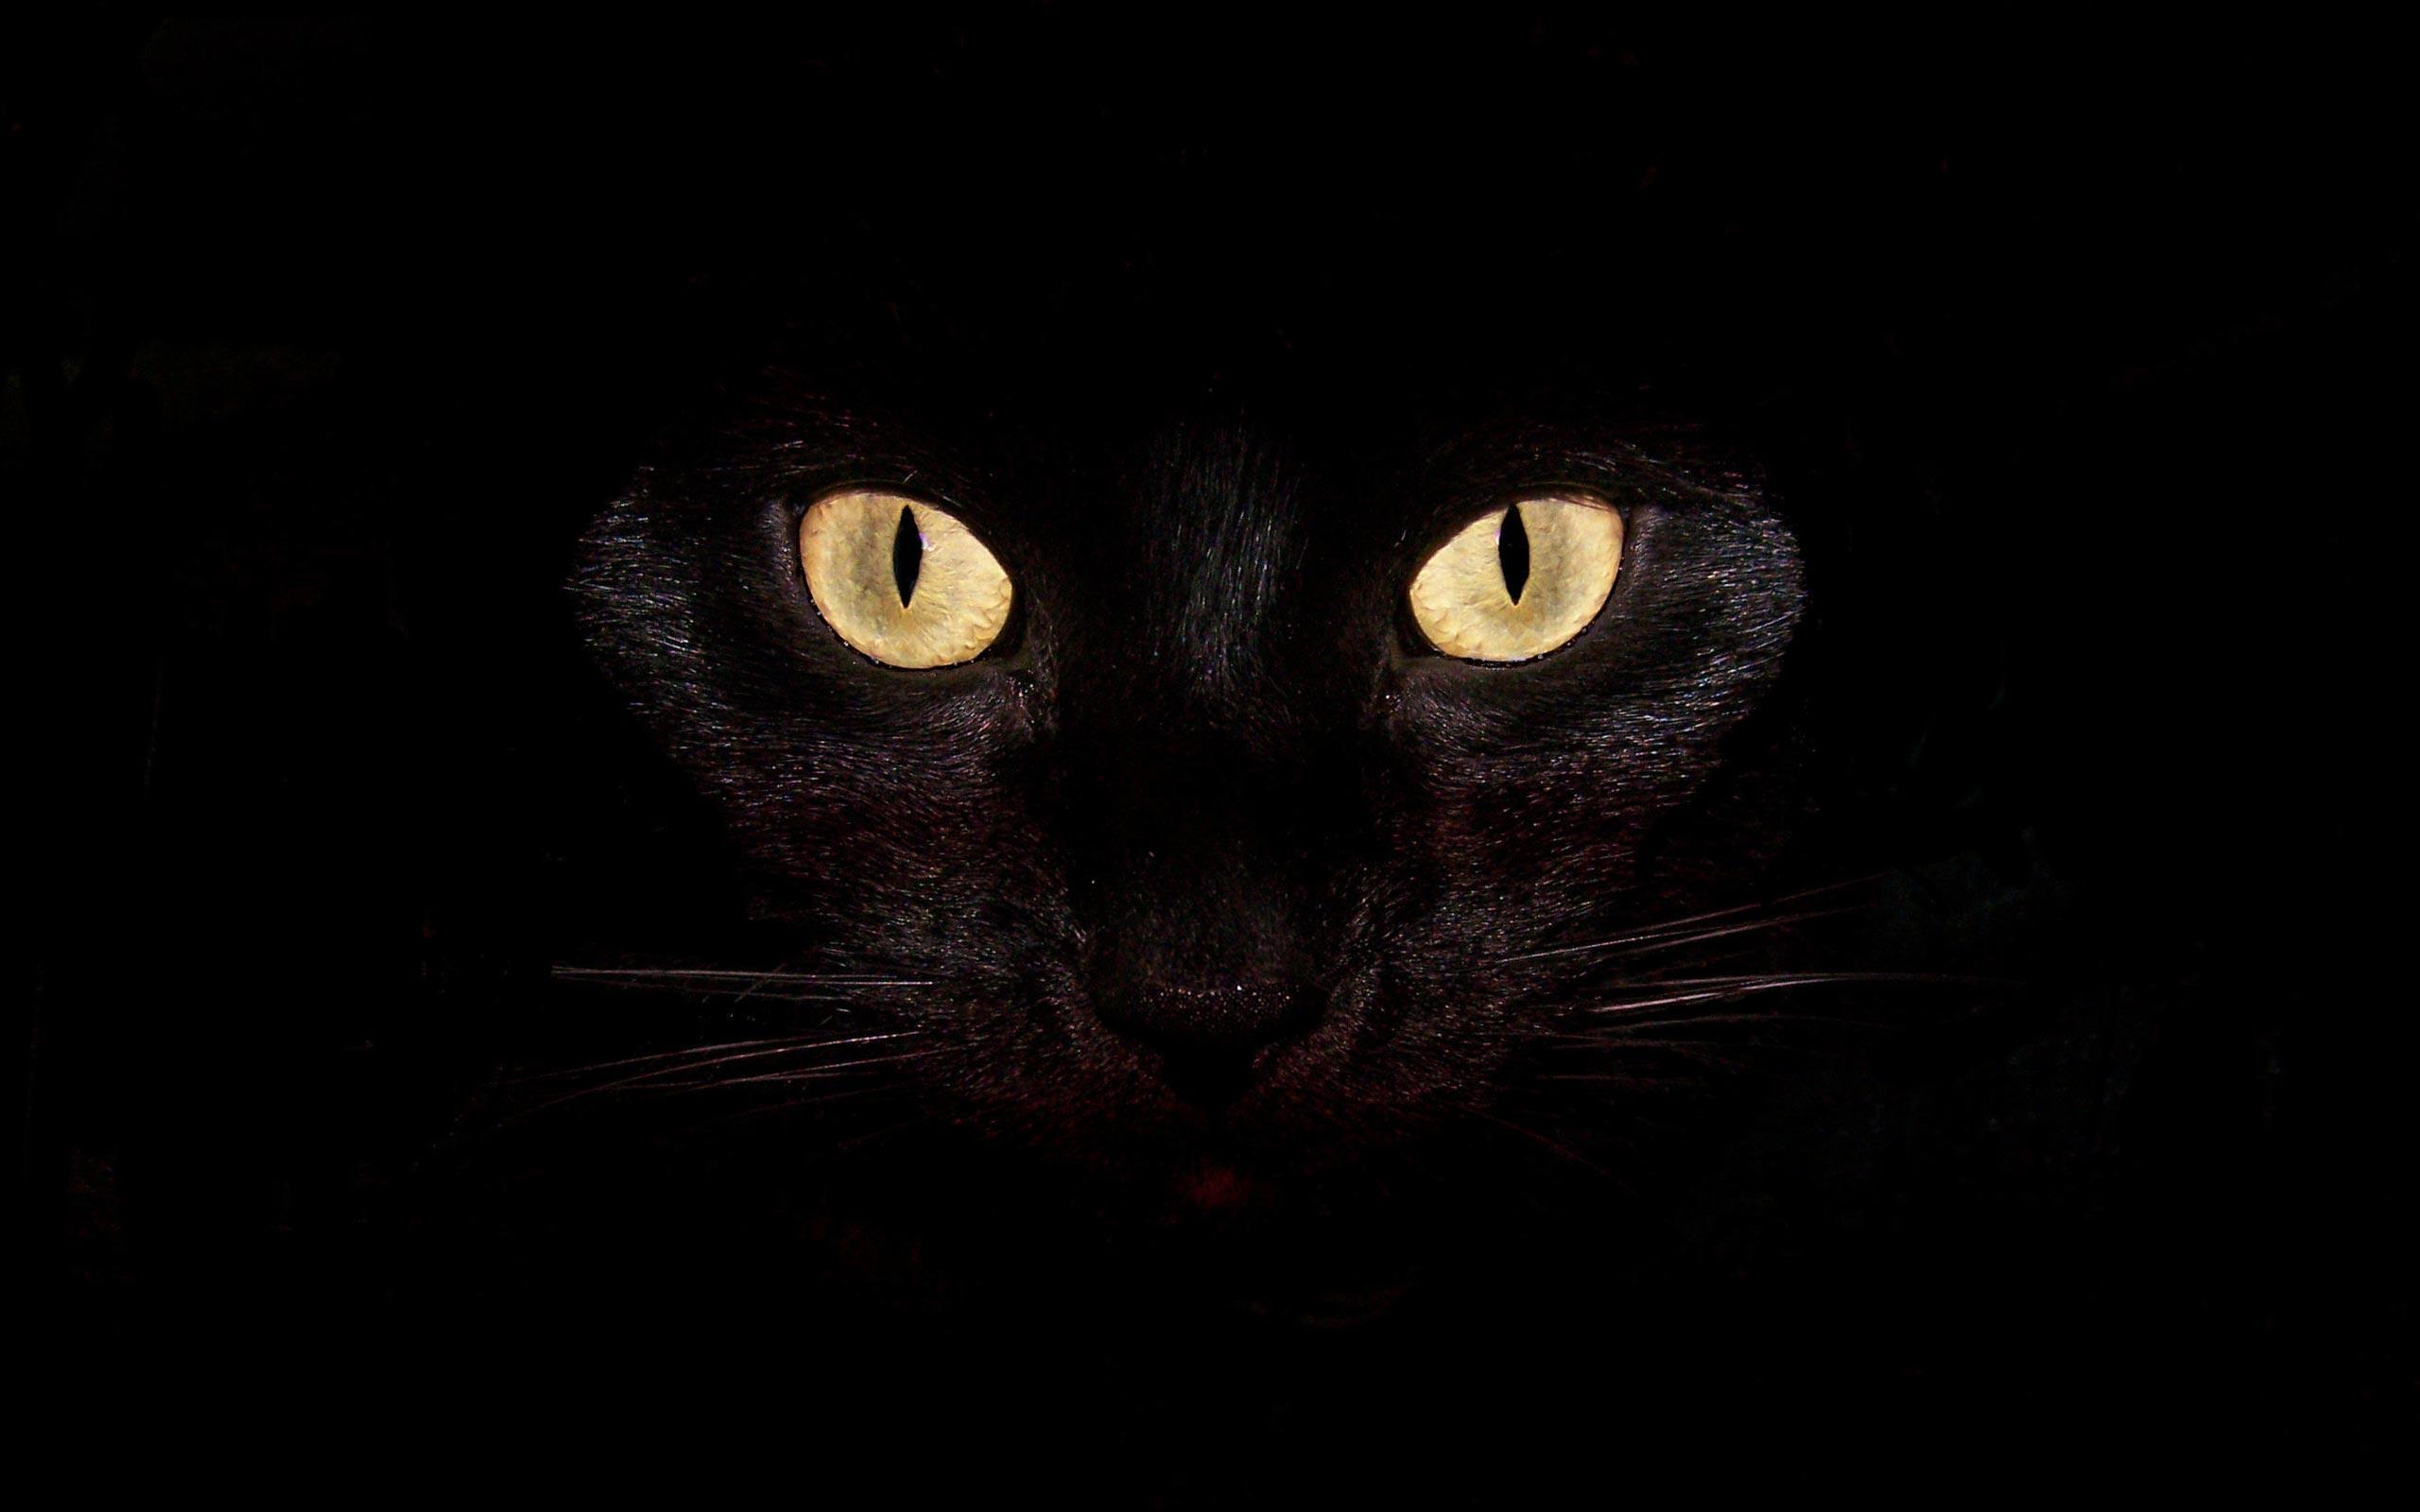 Black cat desktop backgrounds Wallpaper 2560x1600